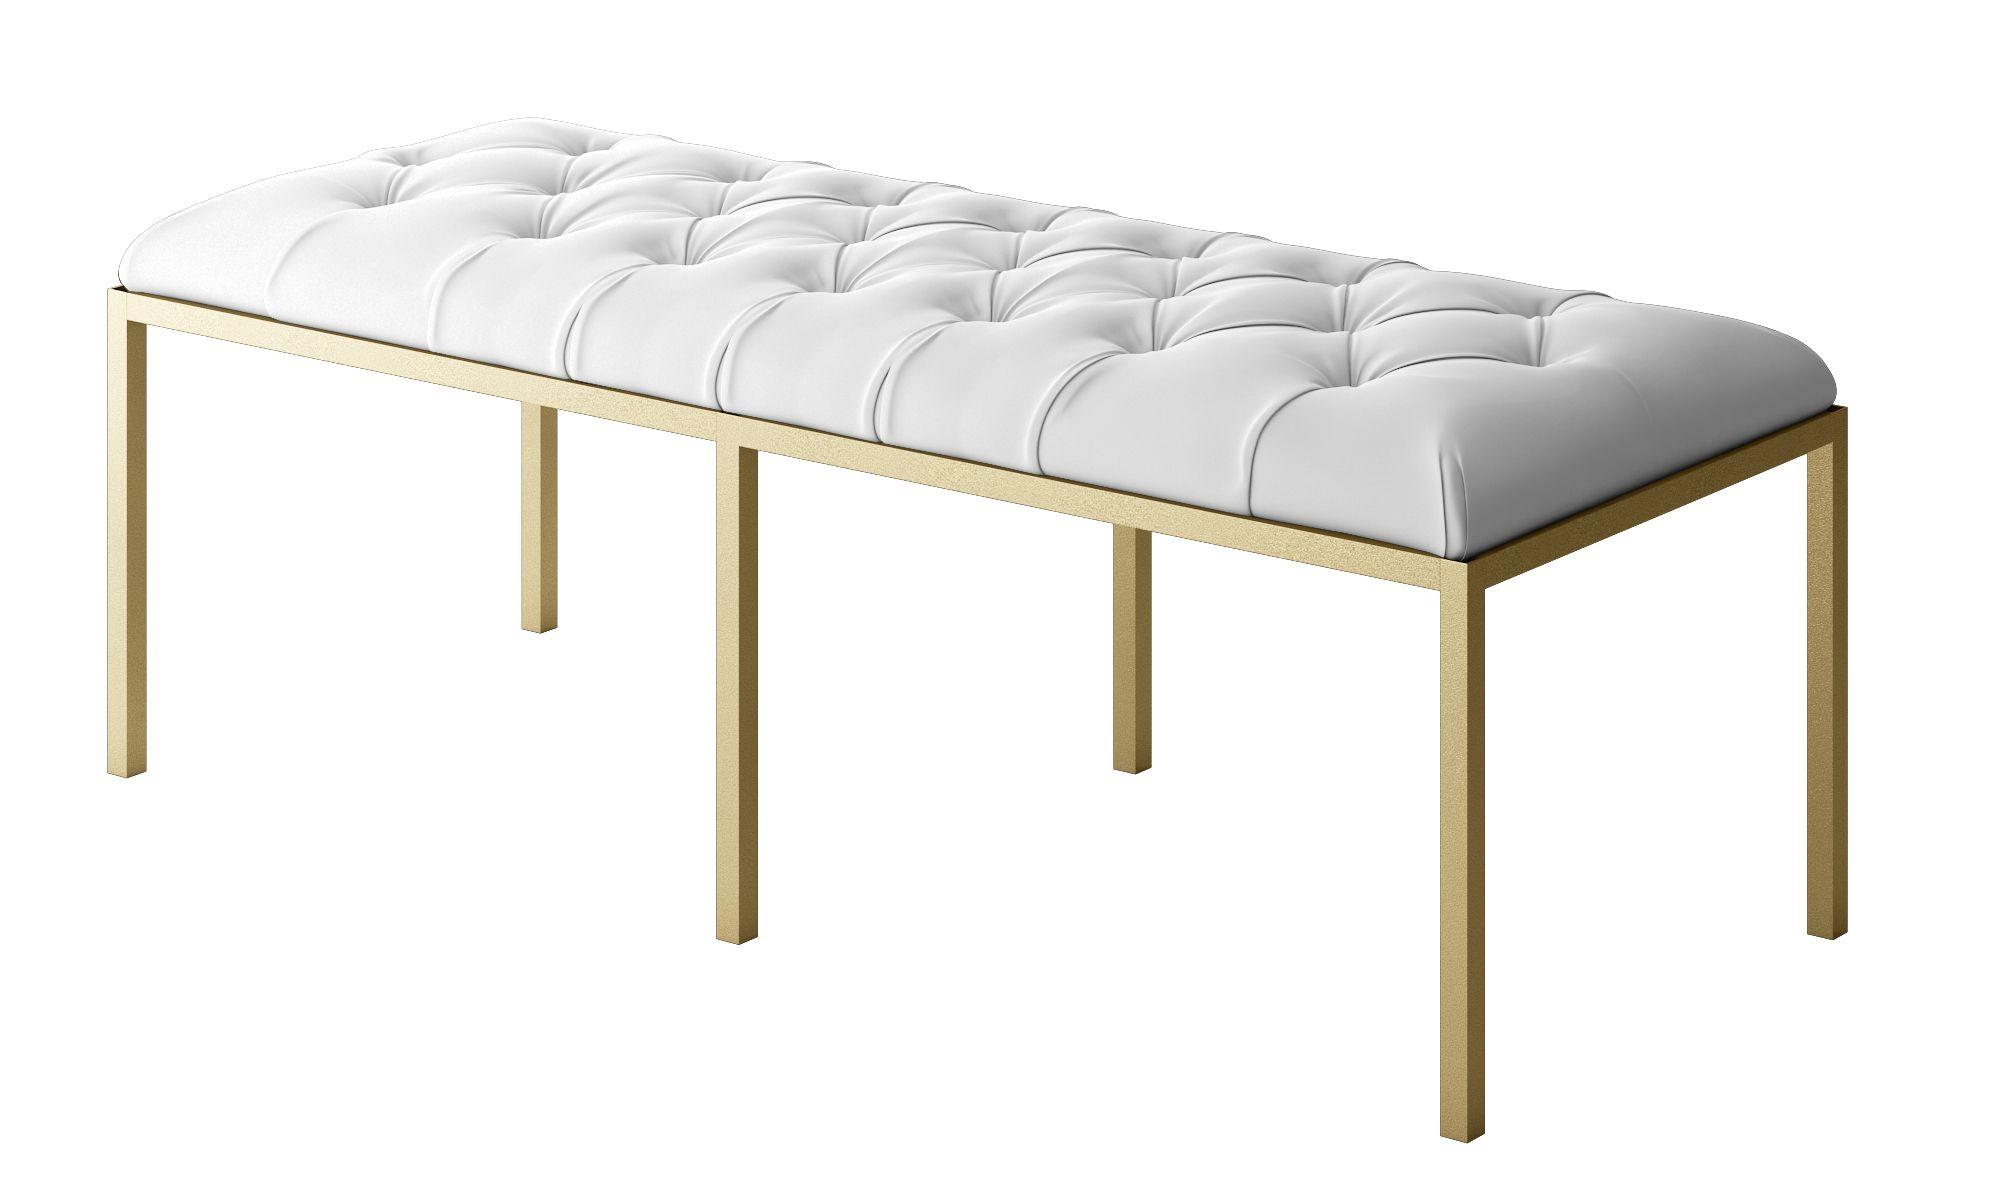 bnch-whites-gdb-ethan-60-the-long-ethan-modern-bench-60-inch-gold ...